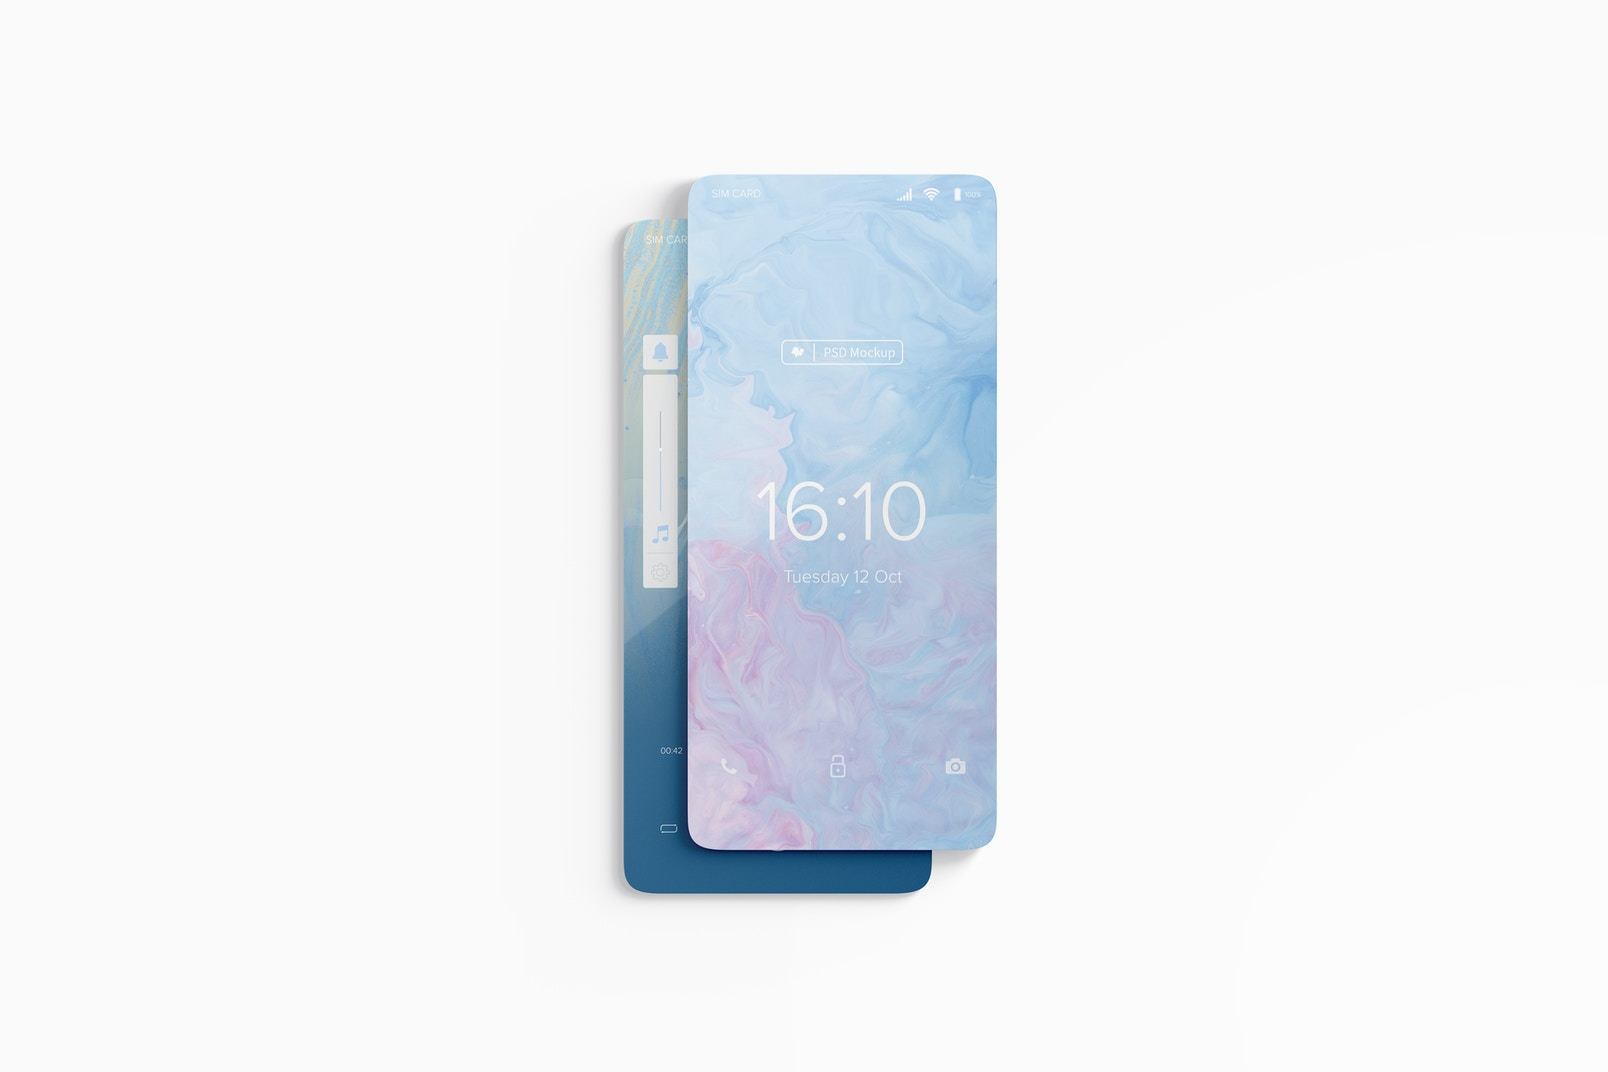 Smartphone Screens Mockup, Floating